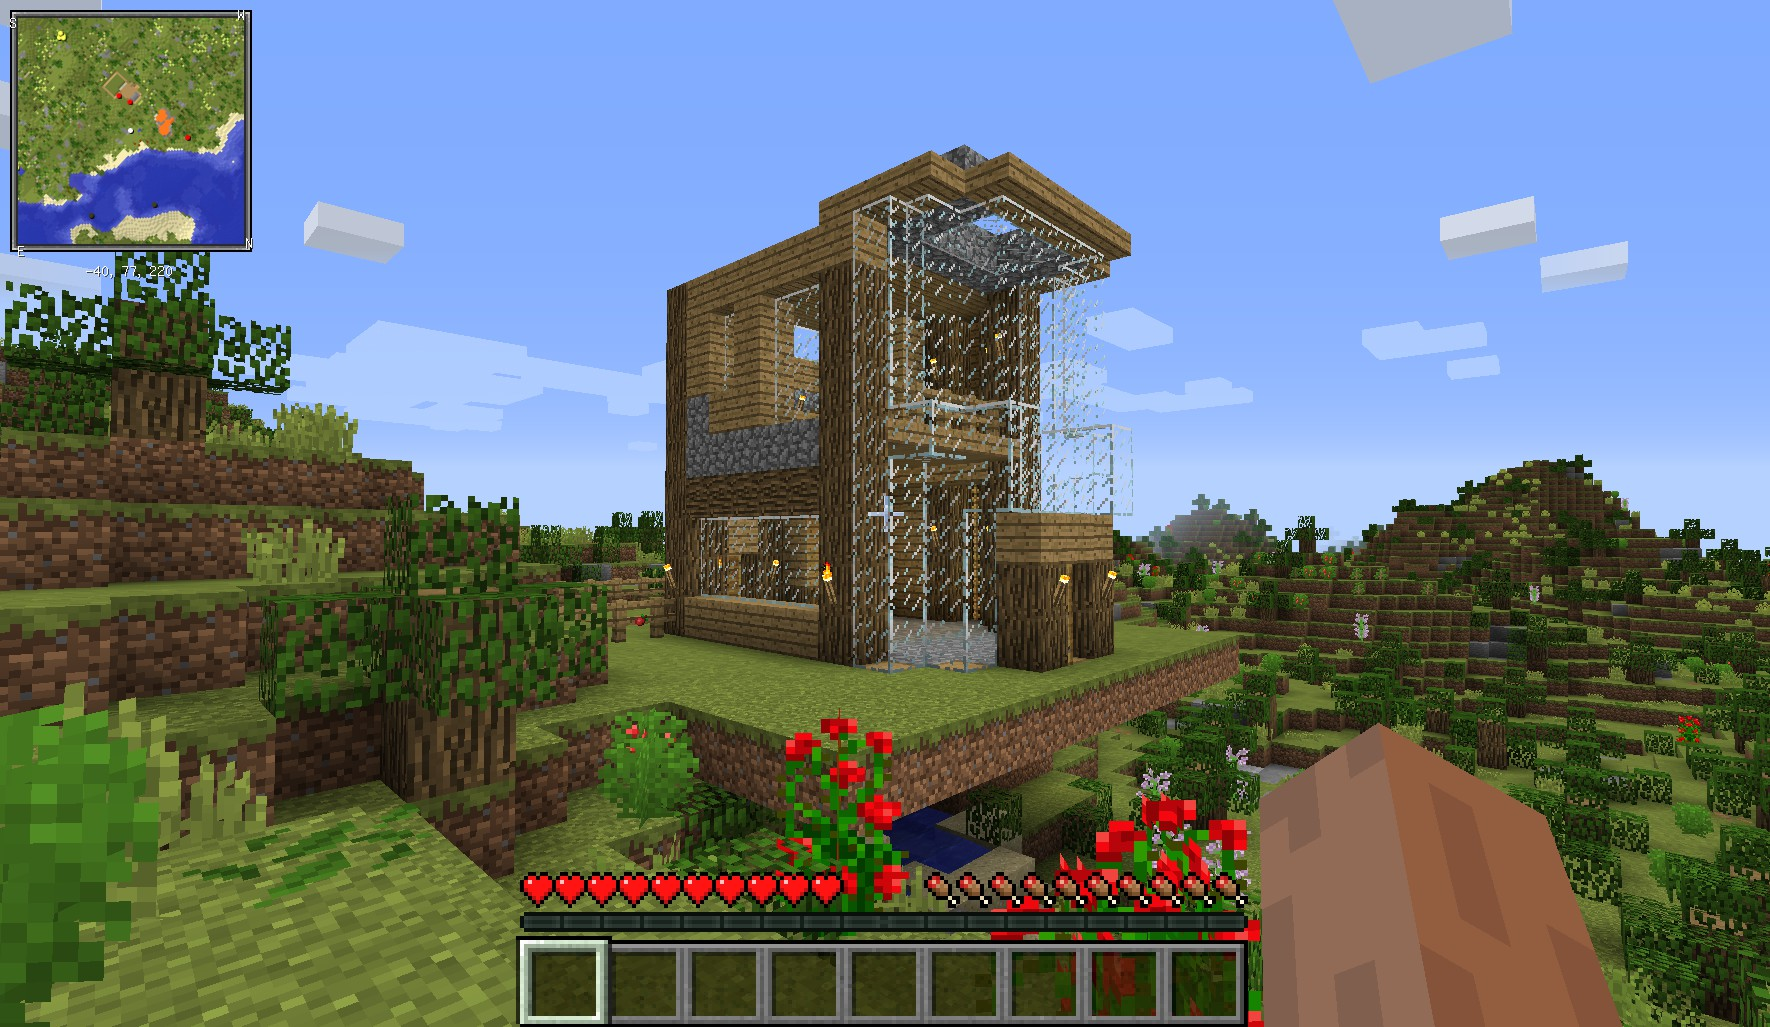 minecraft_049.jpg